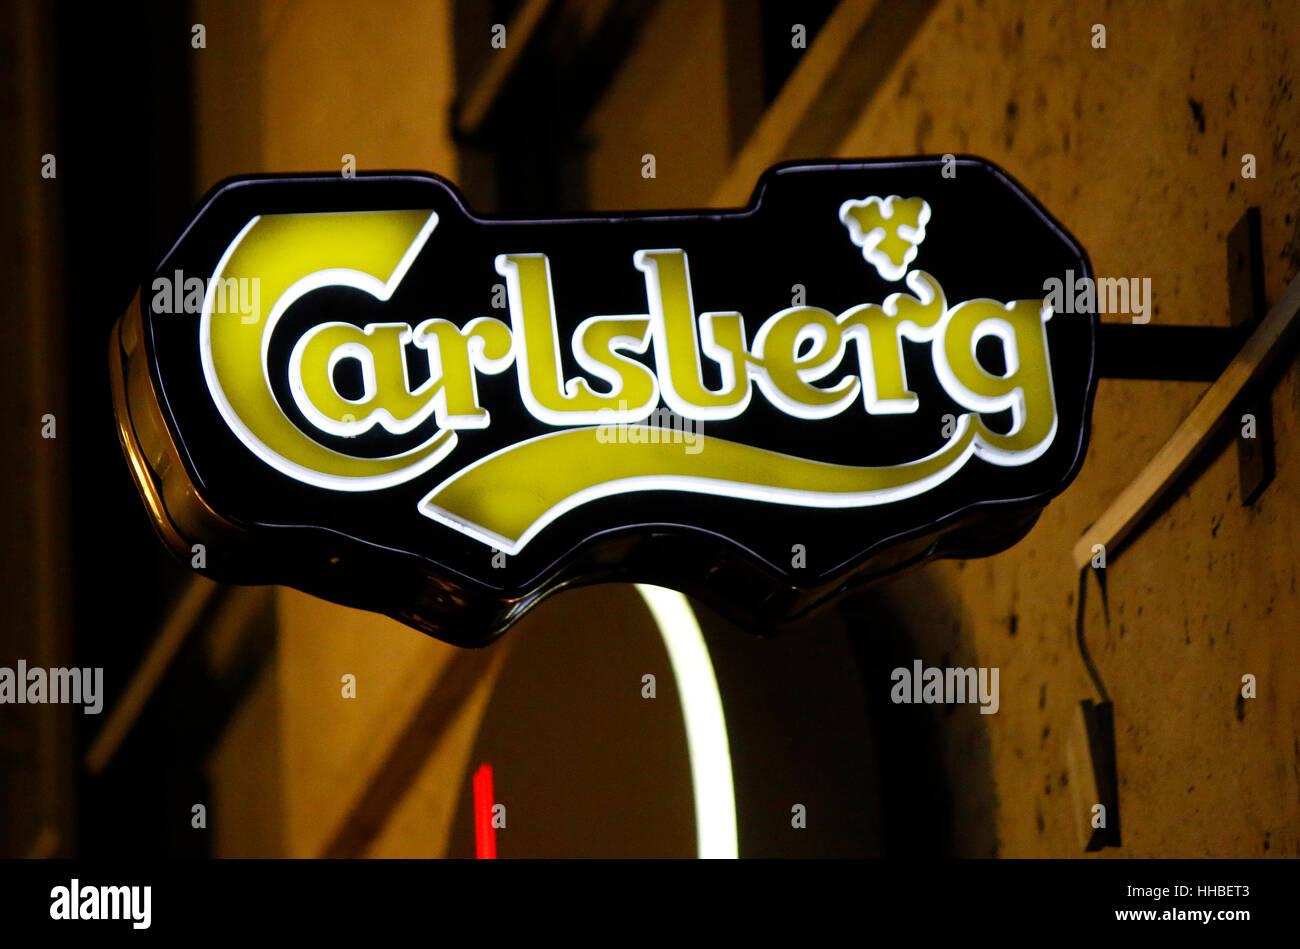 das Logo der Marke 'Carlsberg', Berlin. - Stock Image